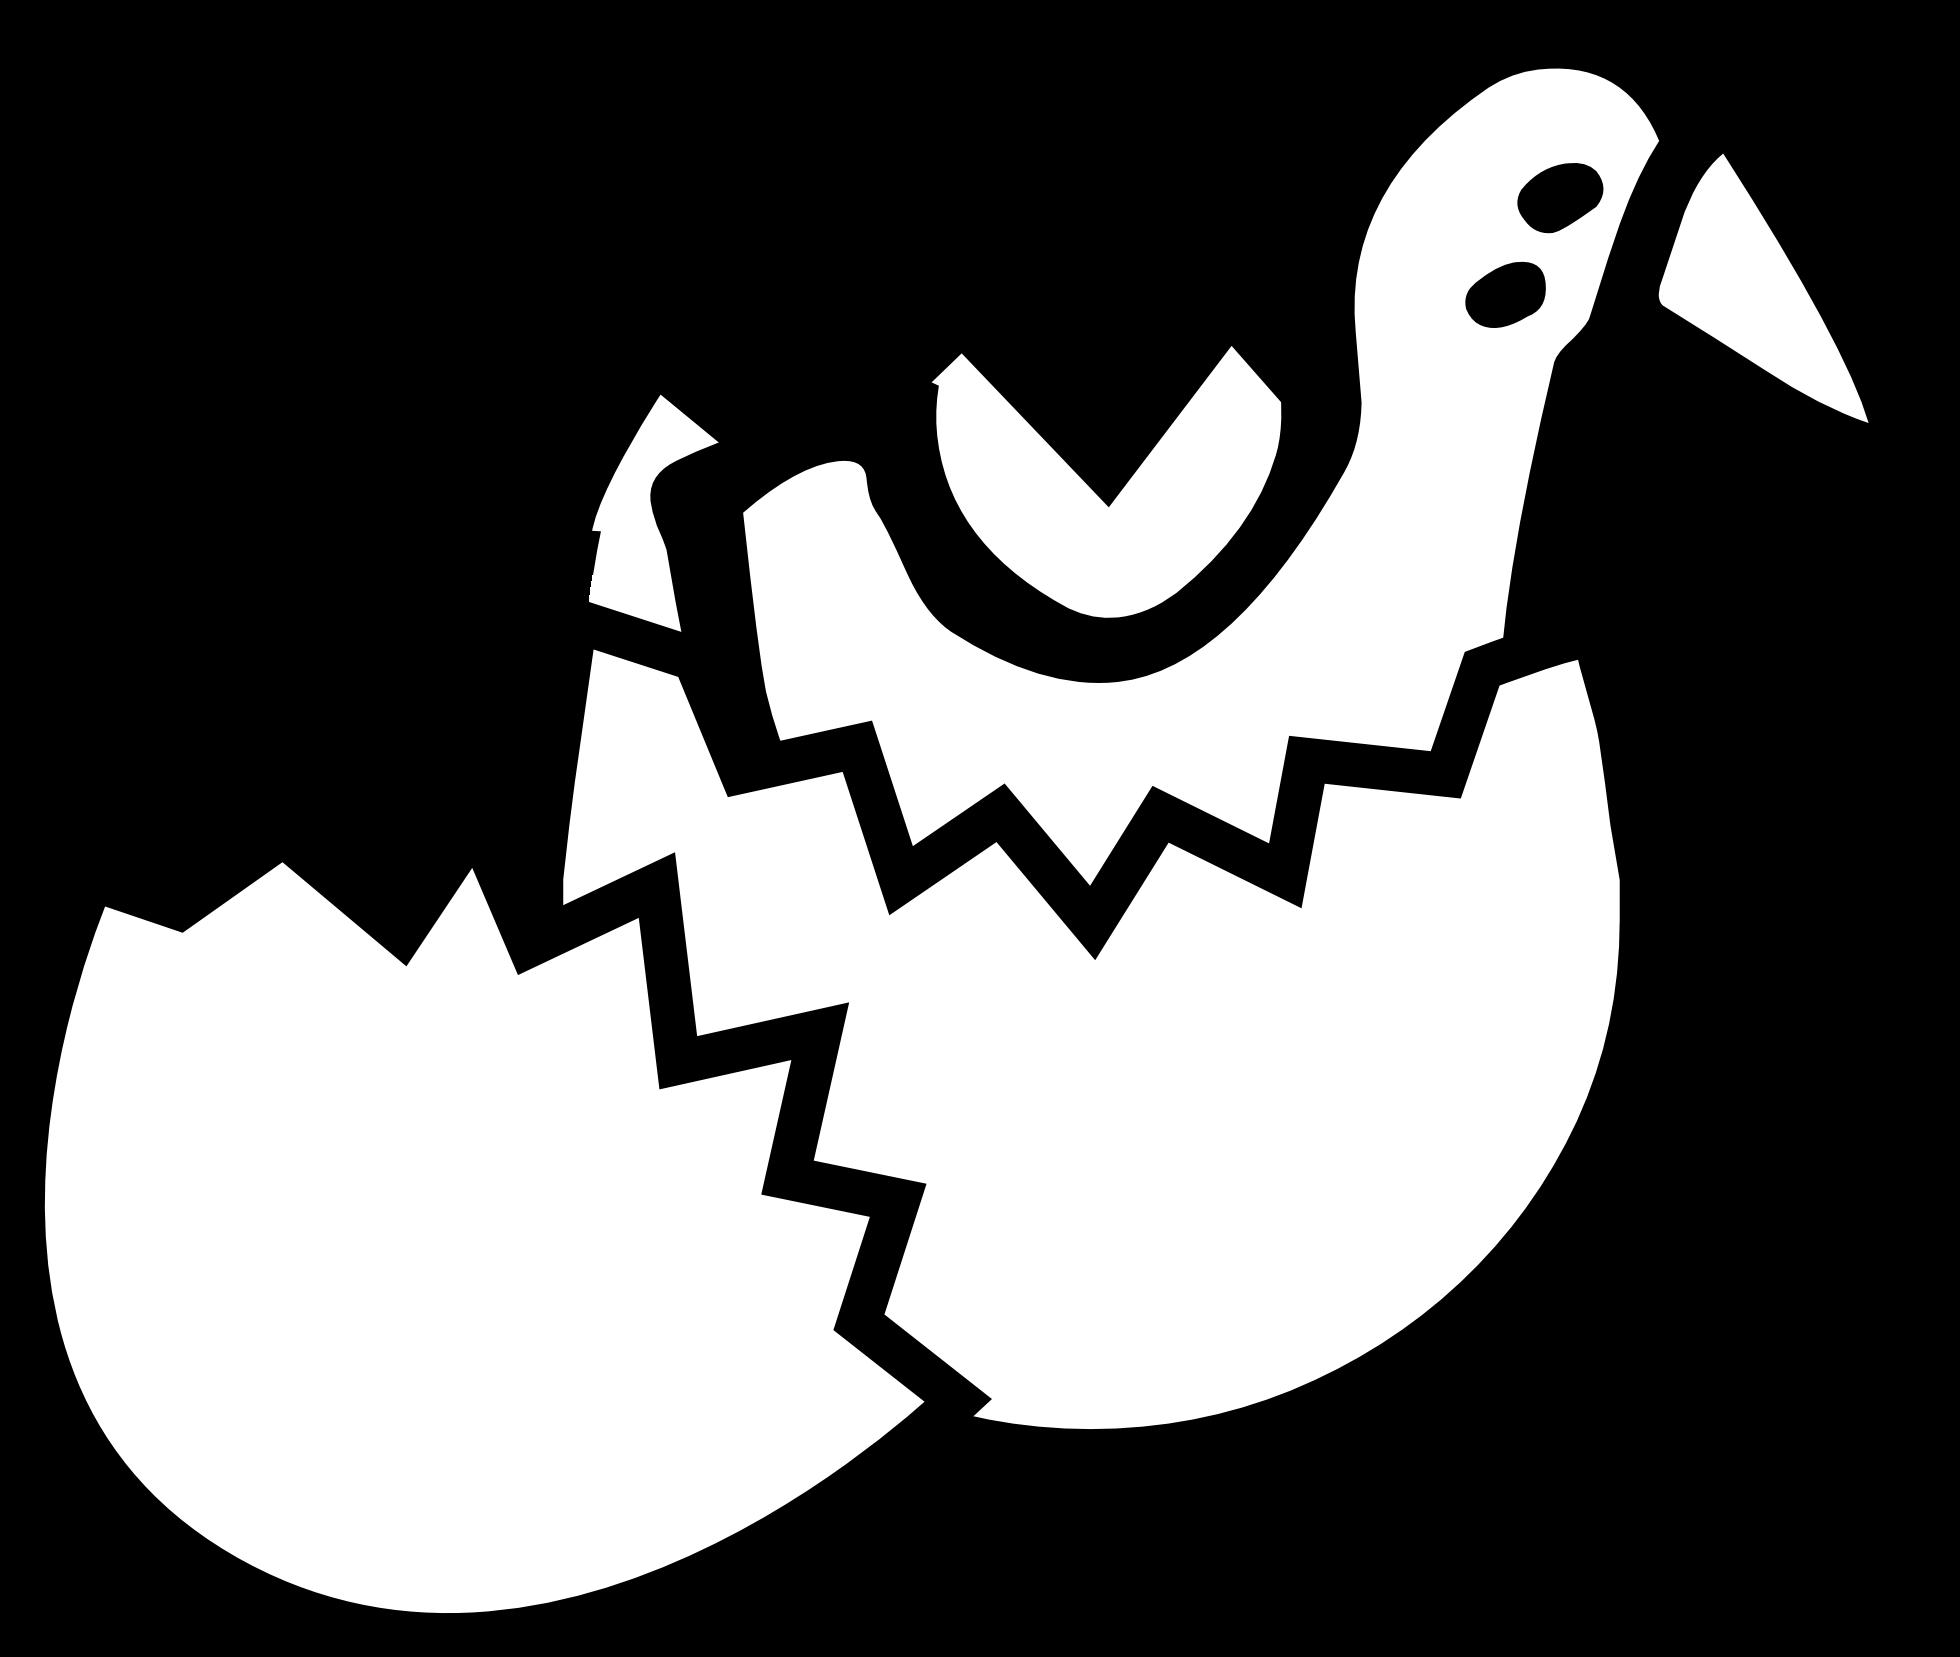 1960x1657 Chick From Egg Black White Line Easter